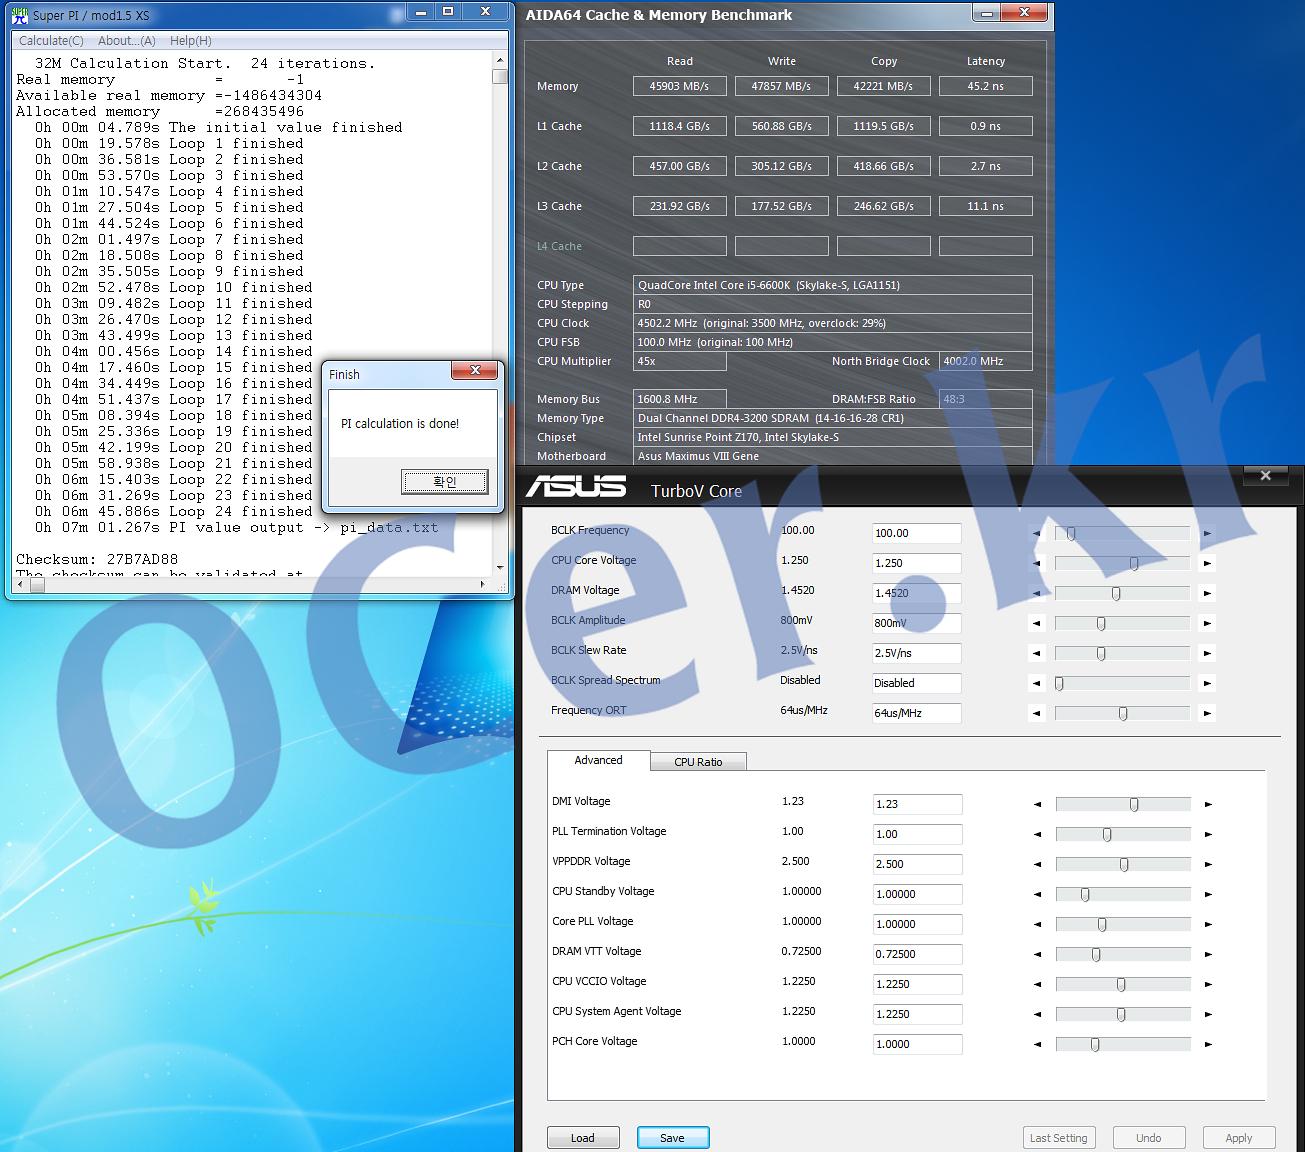 skylake, intel, 인텔, 오버클럭, 오버클러킹, overclocking, overclock, it, 리뷰, 이슈, g.skill, 지스킬, 오버클럭 메모리, G.SKILL F4-3000C15D-8GRK, 고성능메모리,티뮤정품,g.skill메모리,게이밍메모리,립죠스